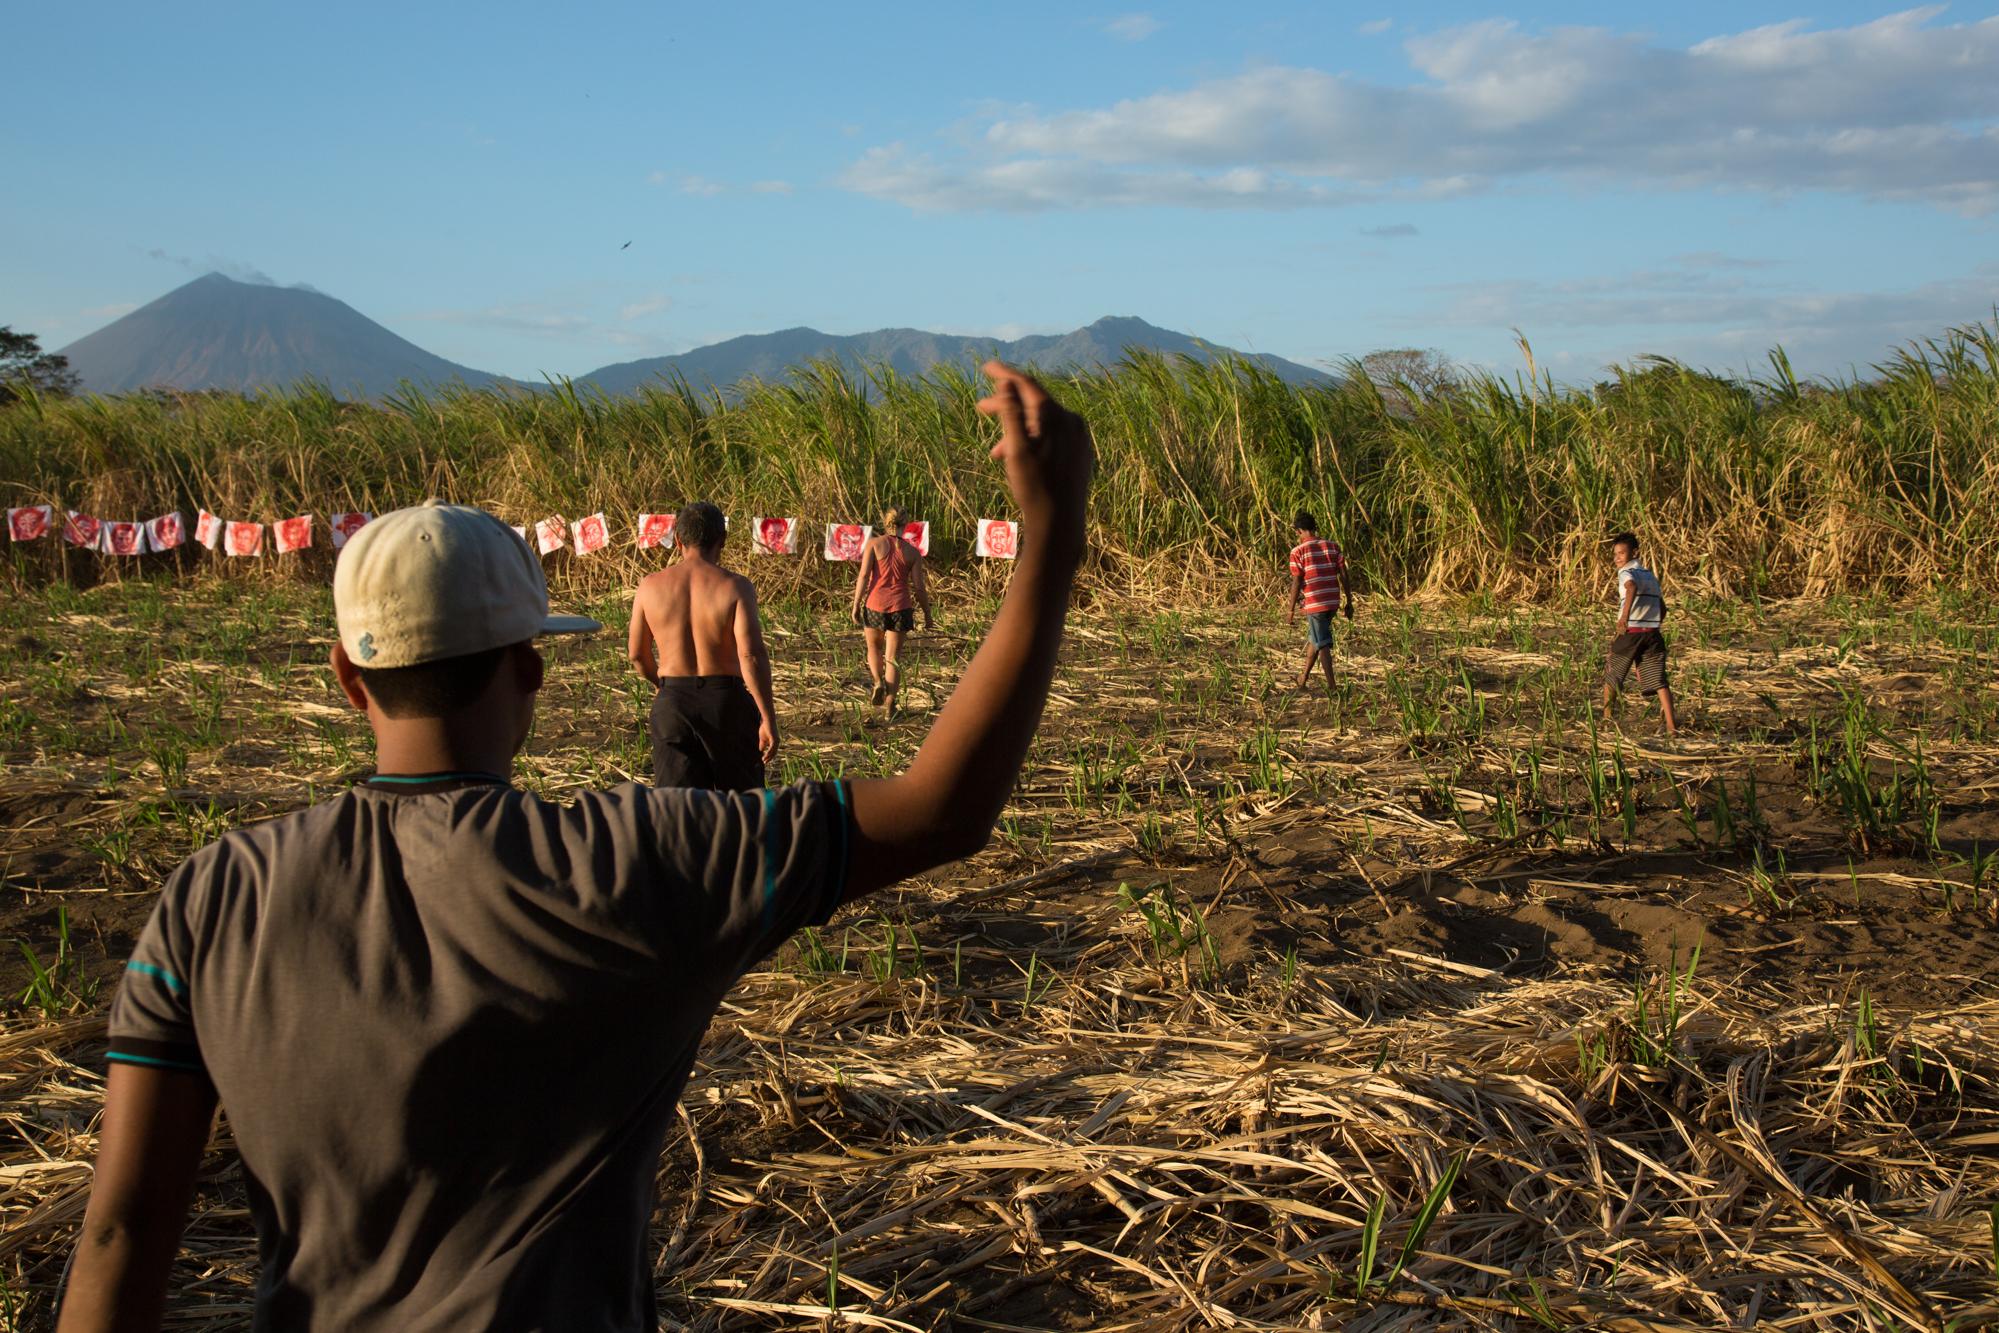 The installation of 'Empalagoso (Saccharine)' in the sugarcane fields of Chichigalpa, Nicaragua